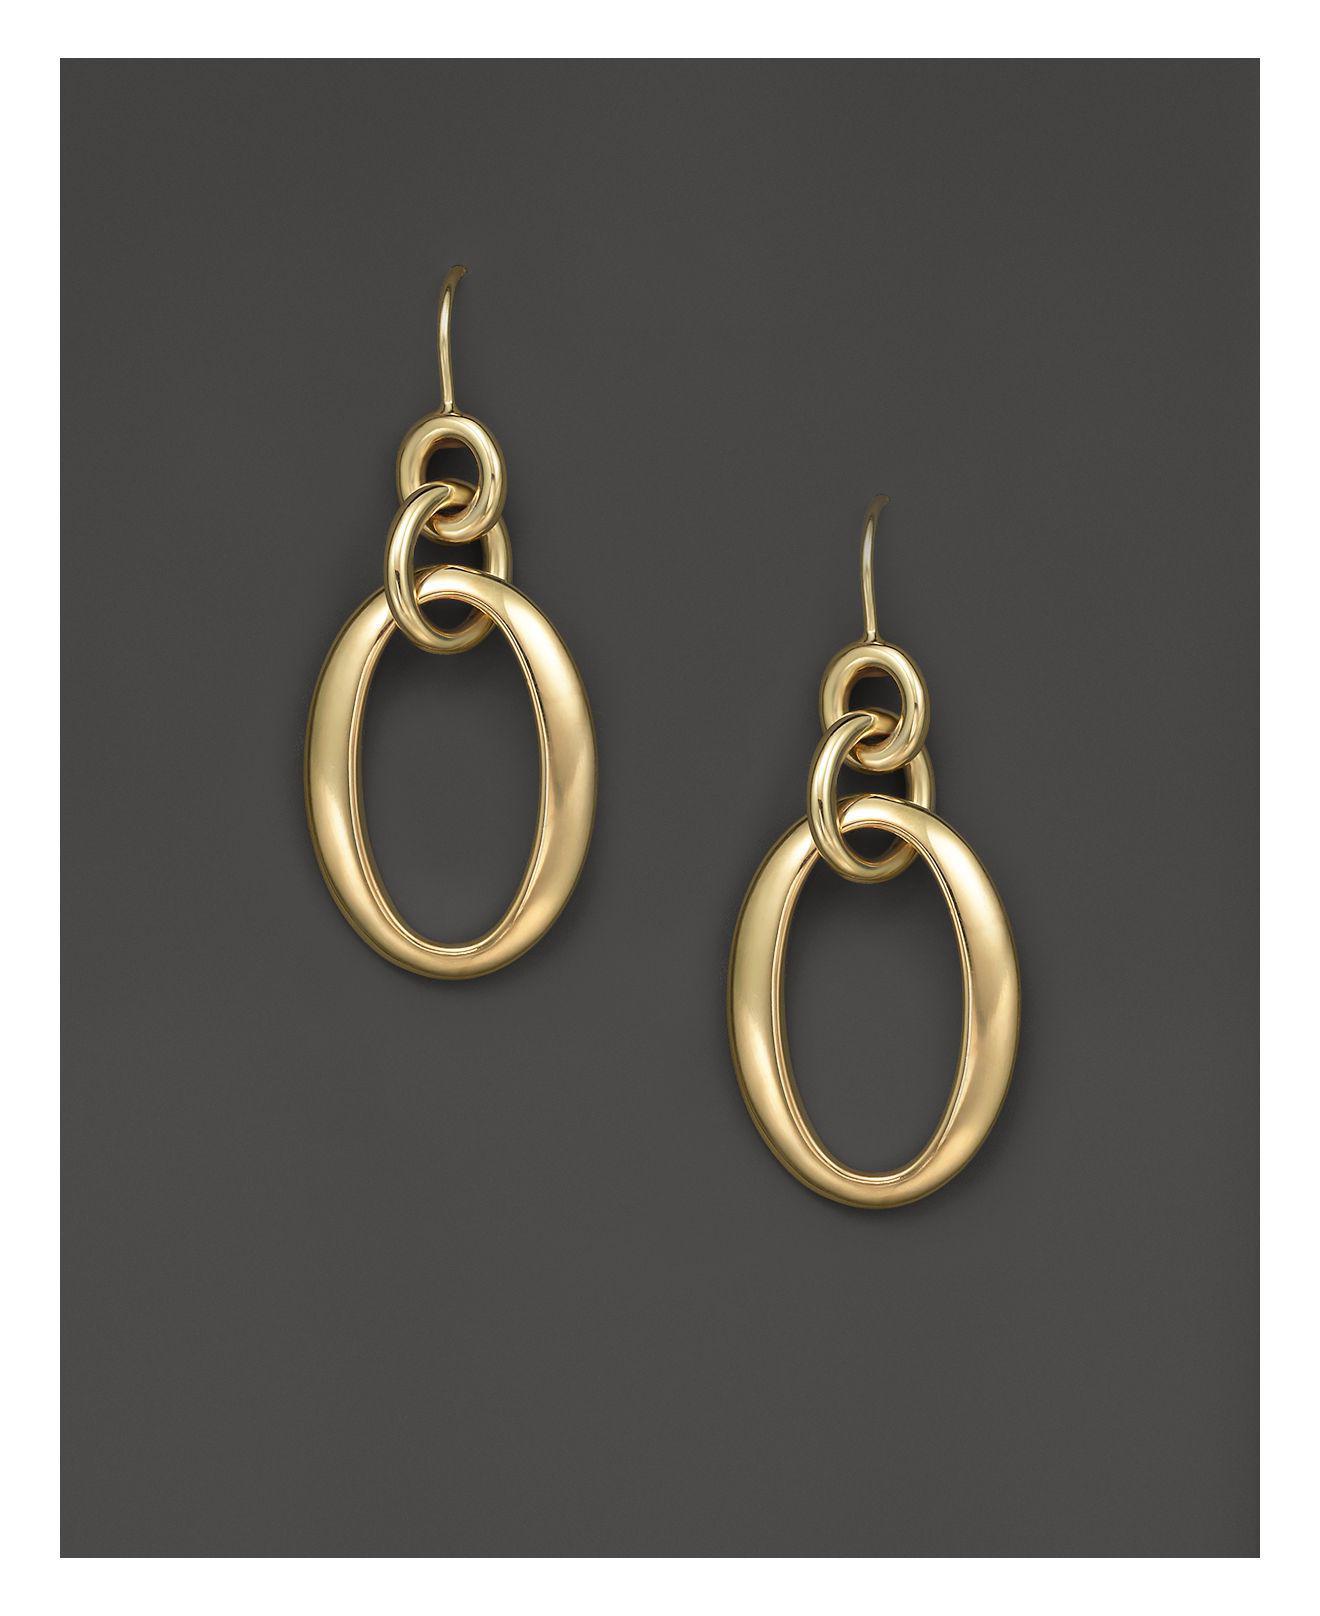 Ippolita 18k Glamazon Short Oval Link Earrings elwQZcg